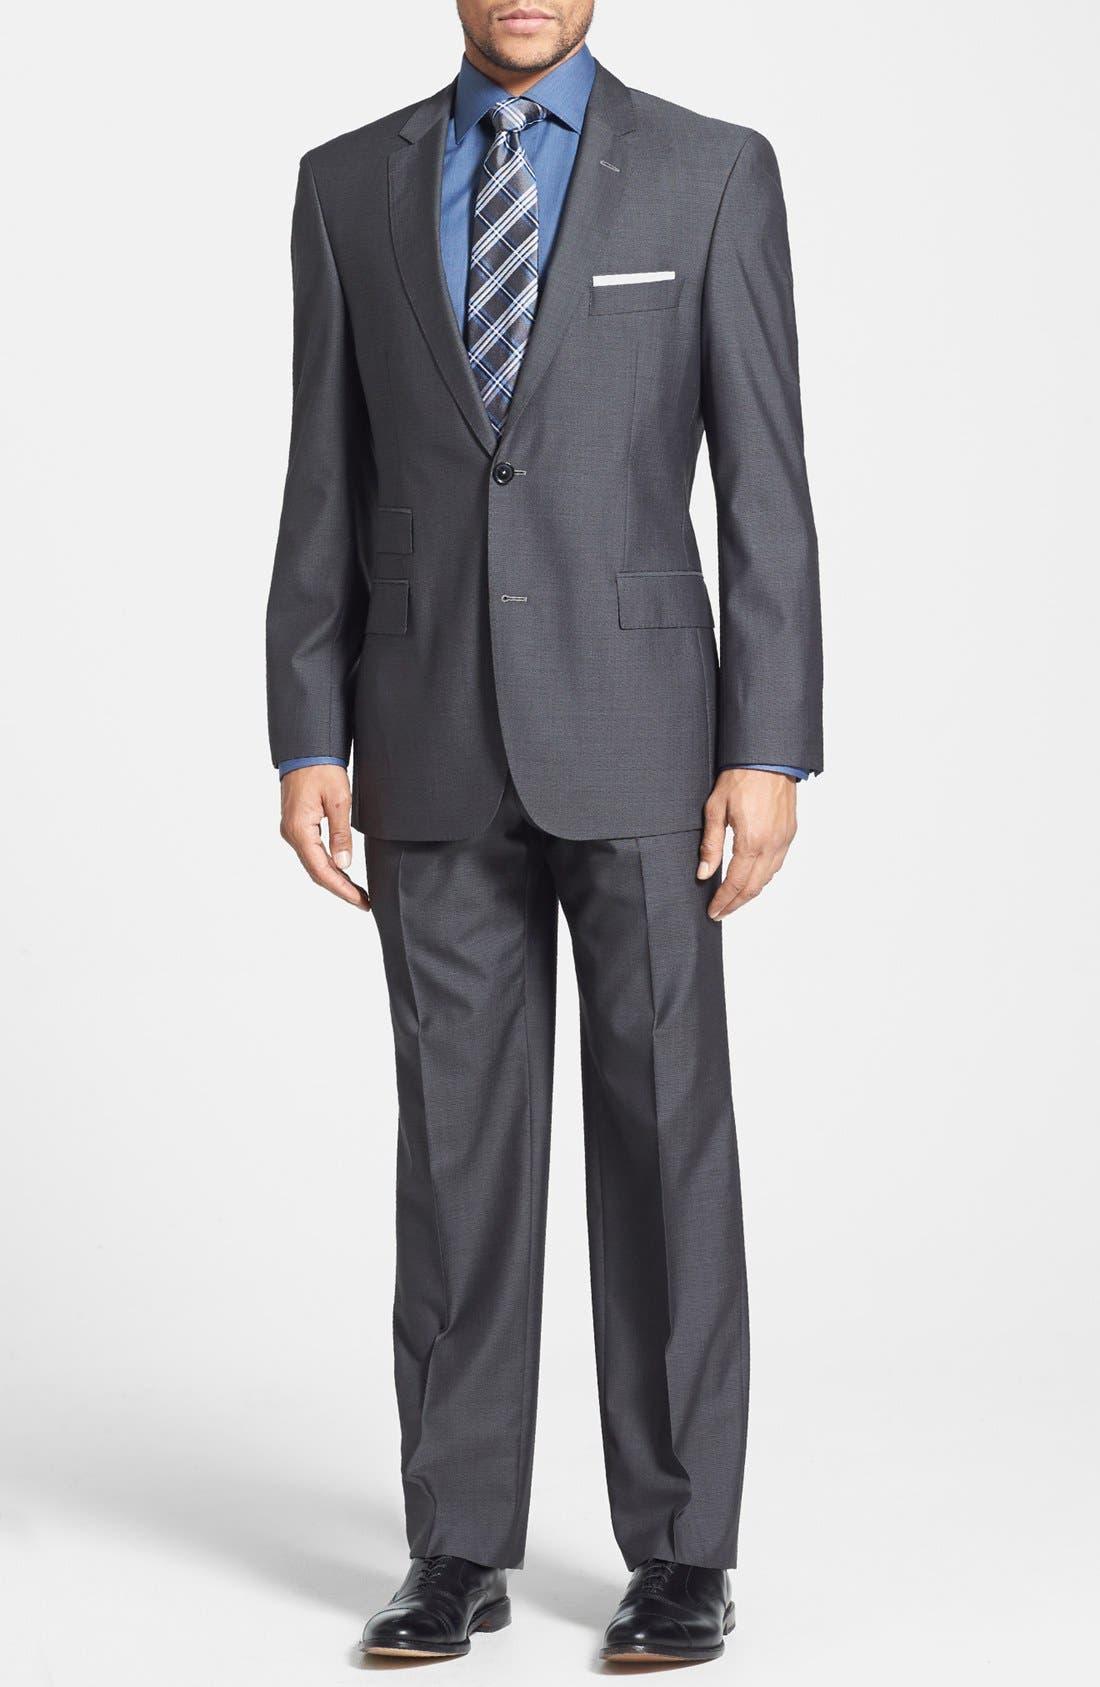 Main Image - BOSS HUGO BOSS 'Edison/Power' Classic Fit Wool Blend Suit